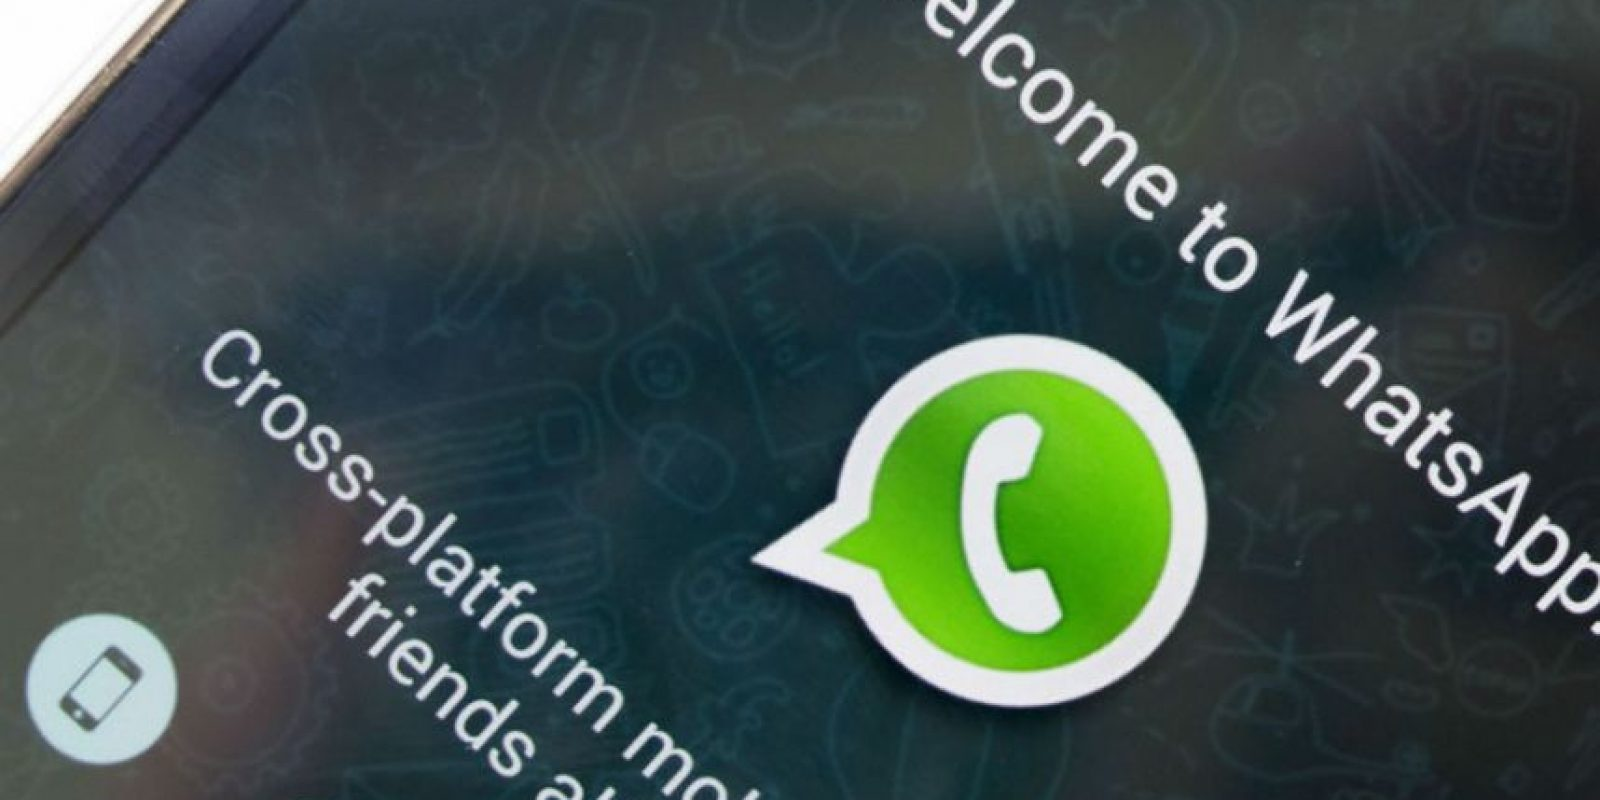 Programar mensajes es posible en WhatsApp. Foto:vía Tumblr.com